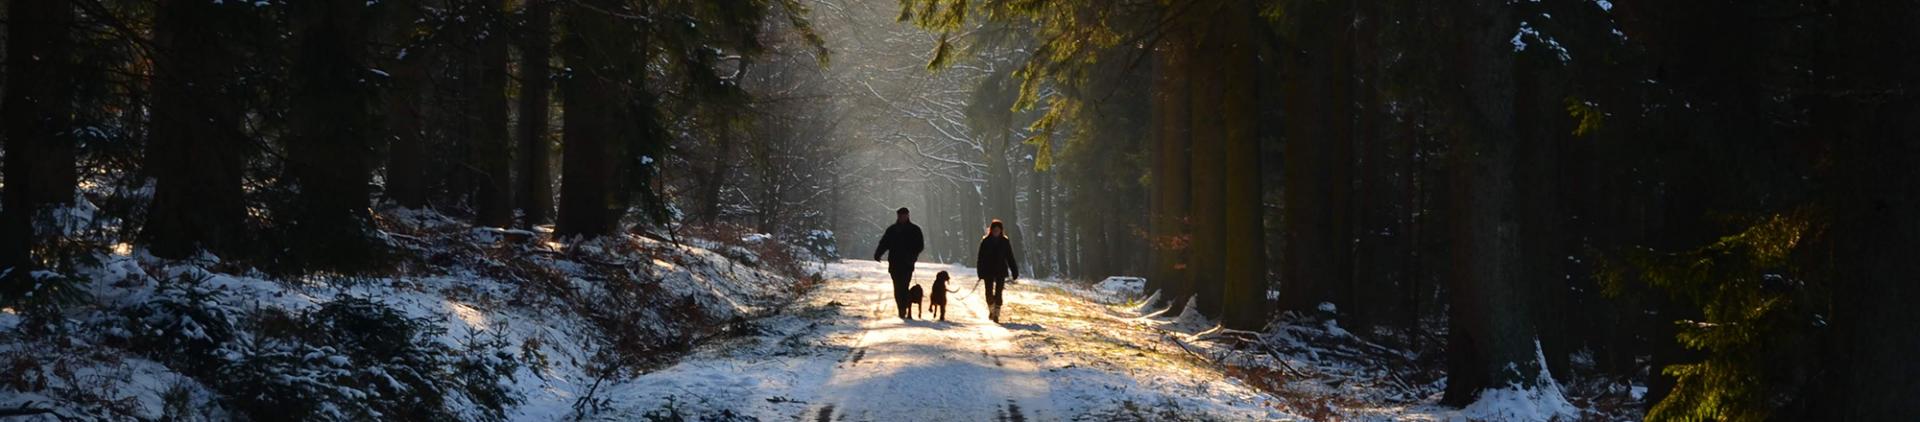 Balades et neige en Province de Liège - Balade